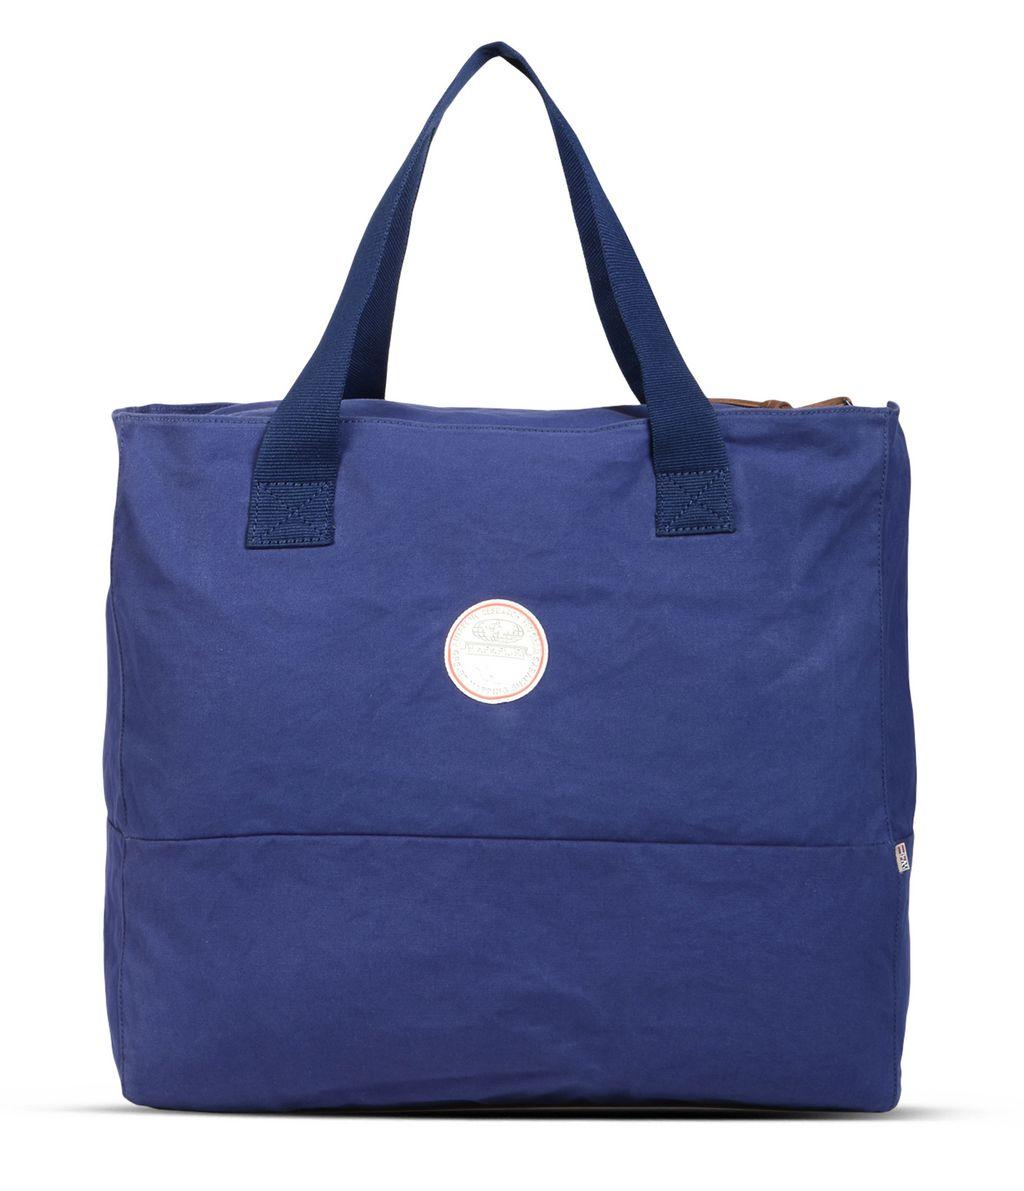 NAPAPIJRI HAWAII TOTE  TOTE & SHOULDER BAG,BRIGHT BLUE